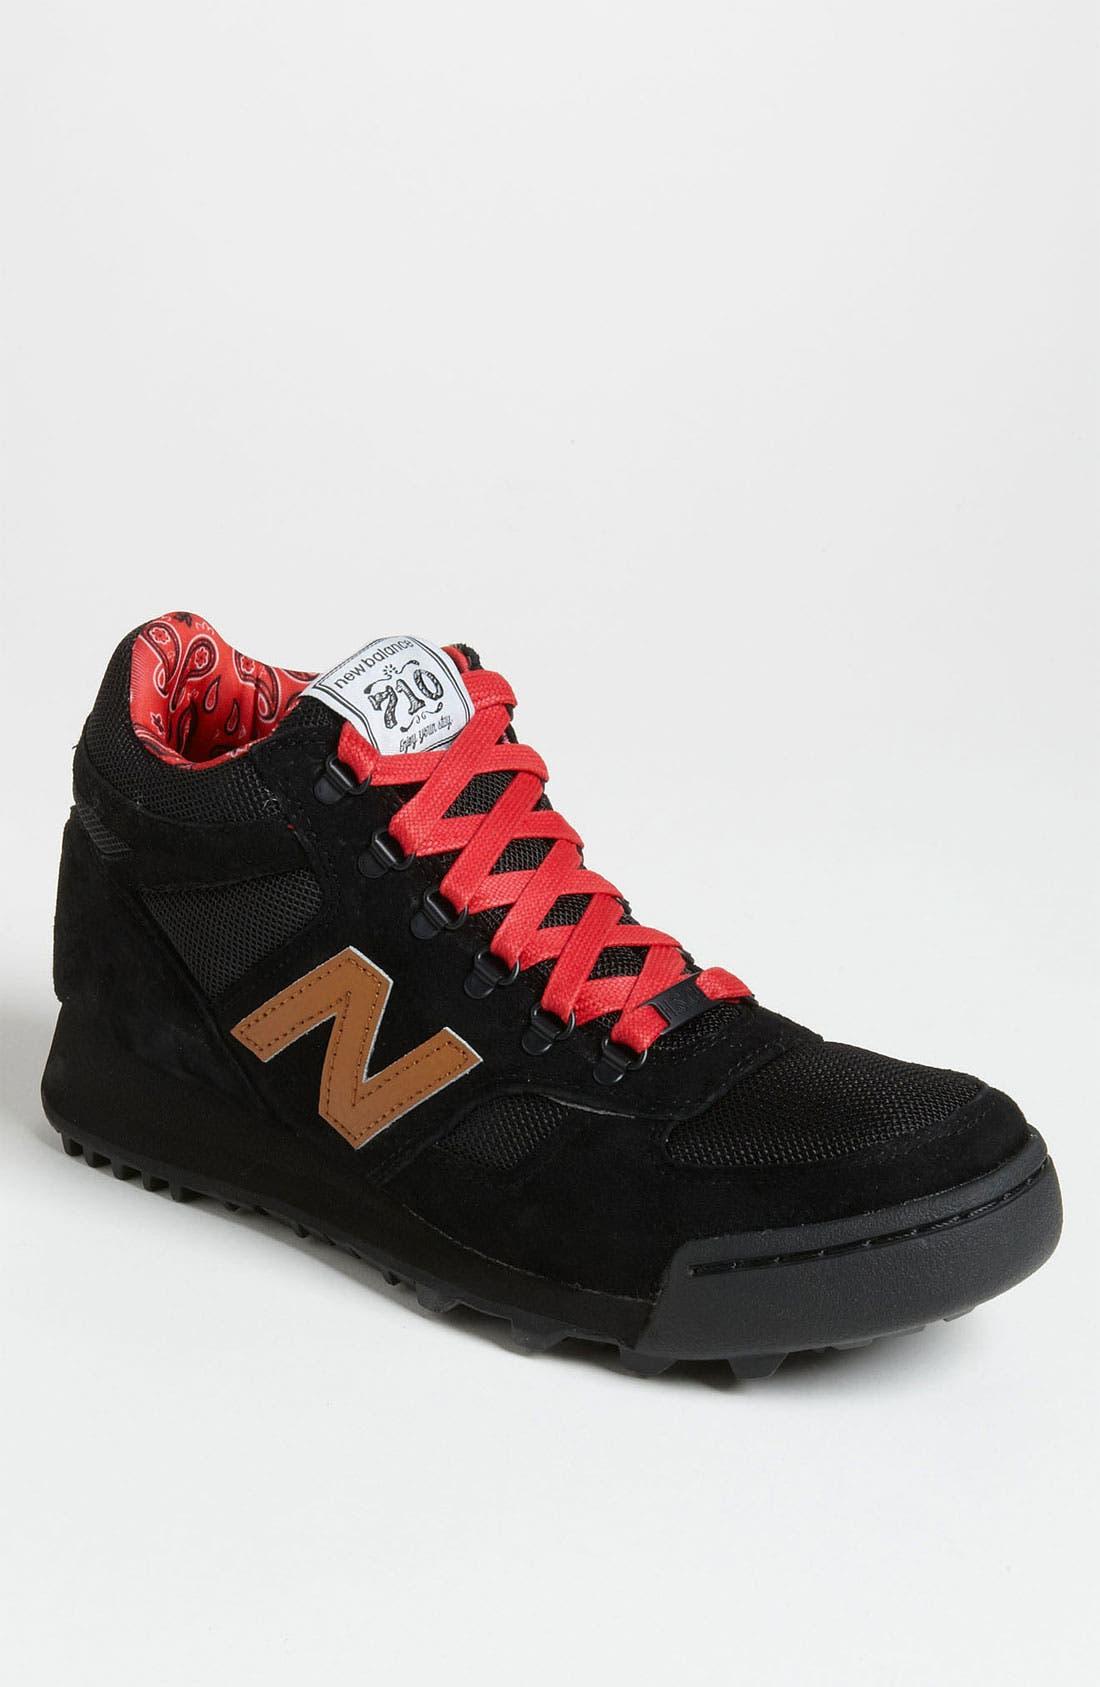 ca7efcd169ceb ... good new balance herschel supply co. 710 sneaker men nordstrom 0de15  bc3b9